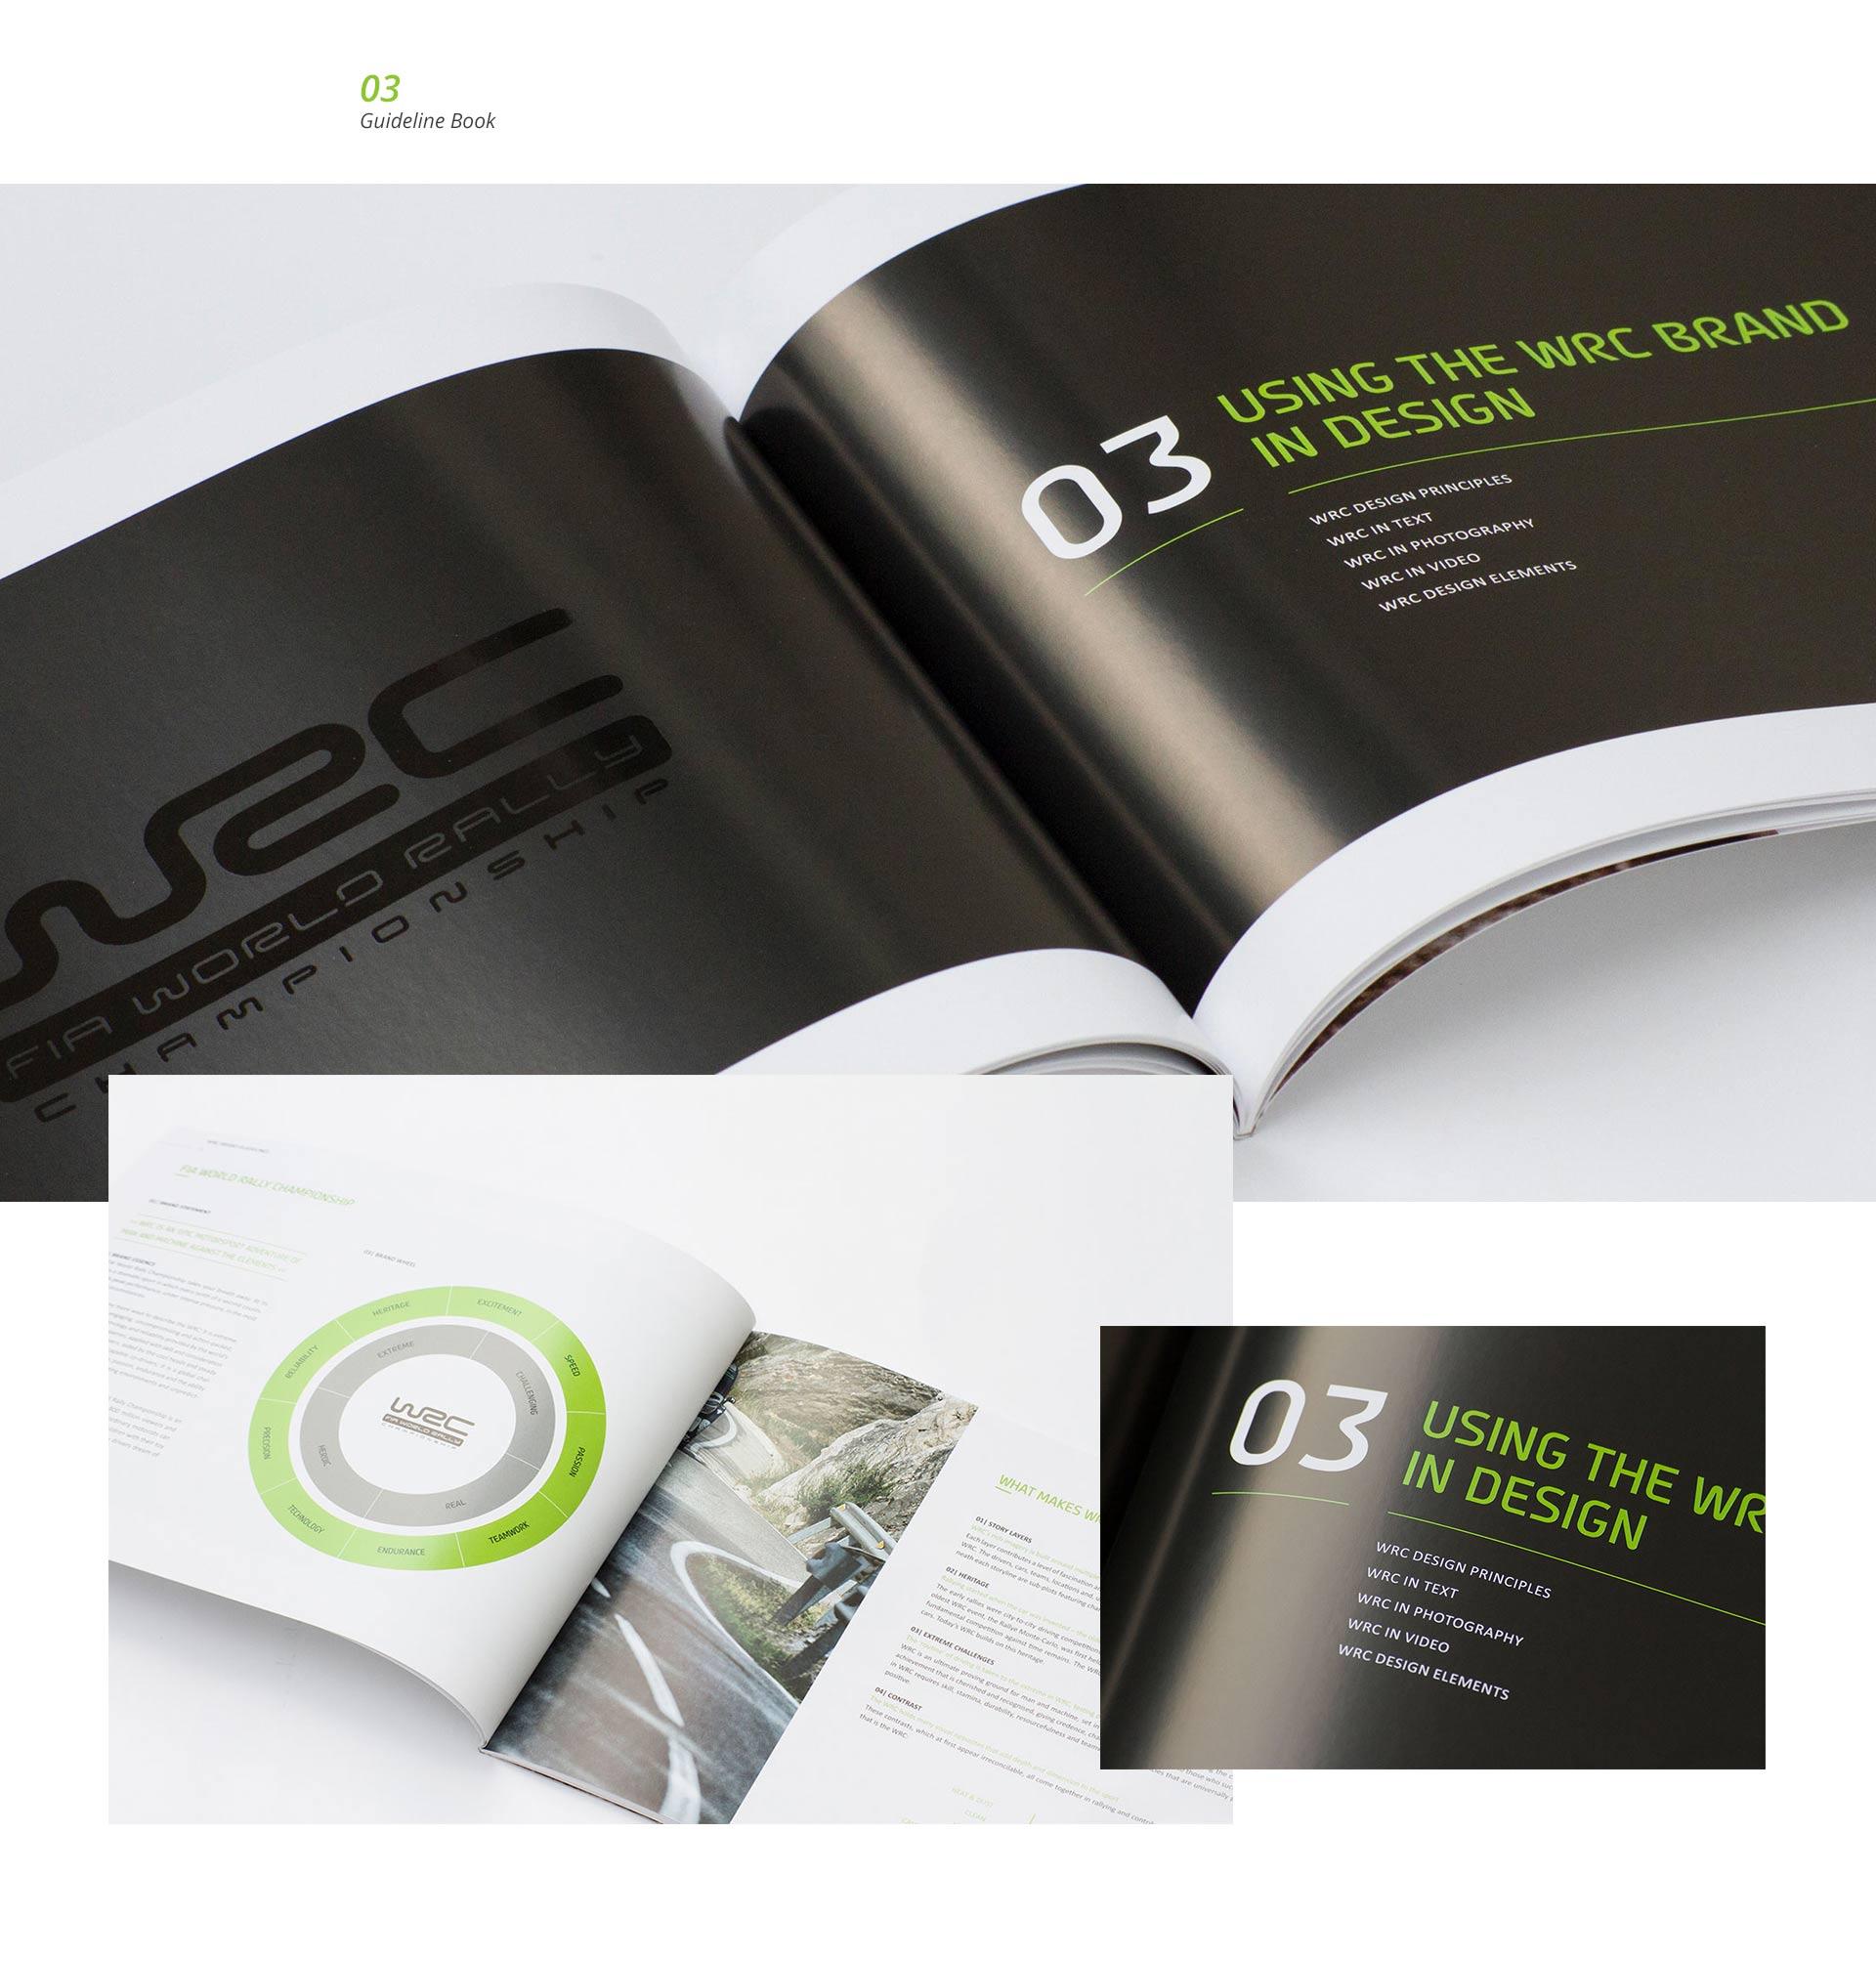 EAZEE Corporate Design WRC Design Guidelines